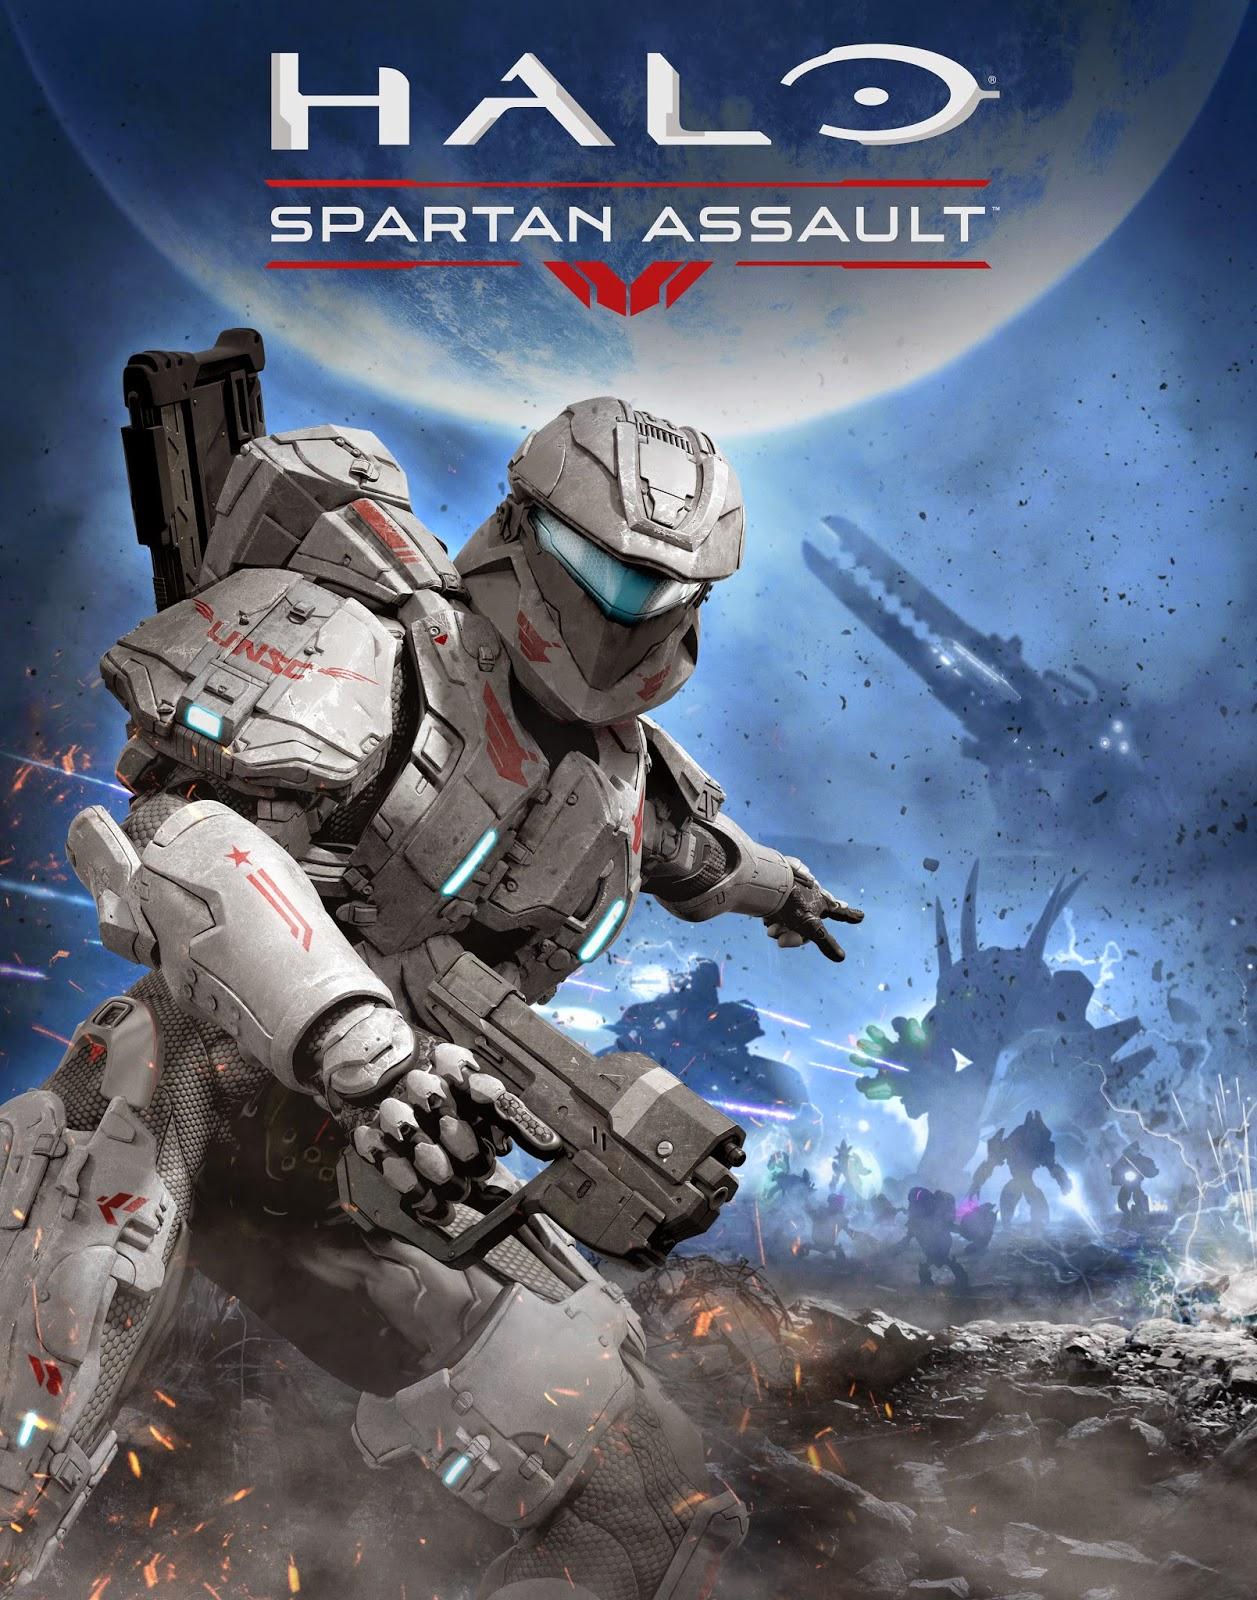 Halo: Combat Evolved 1 32-Bit …